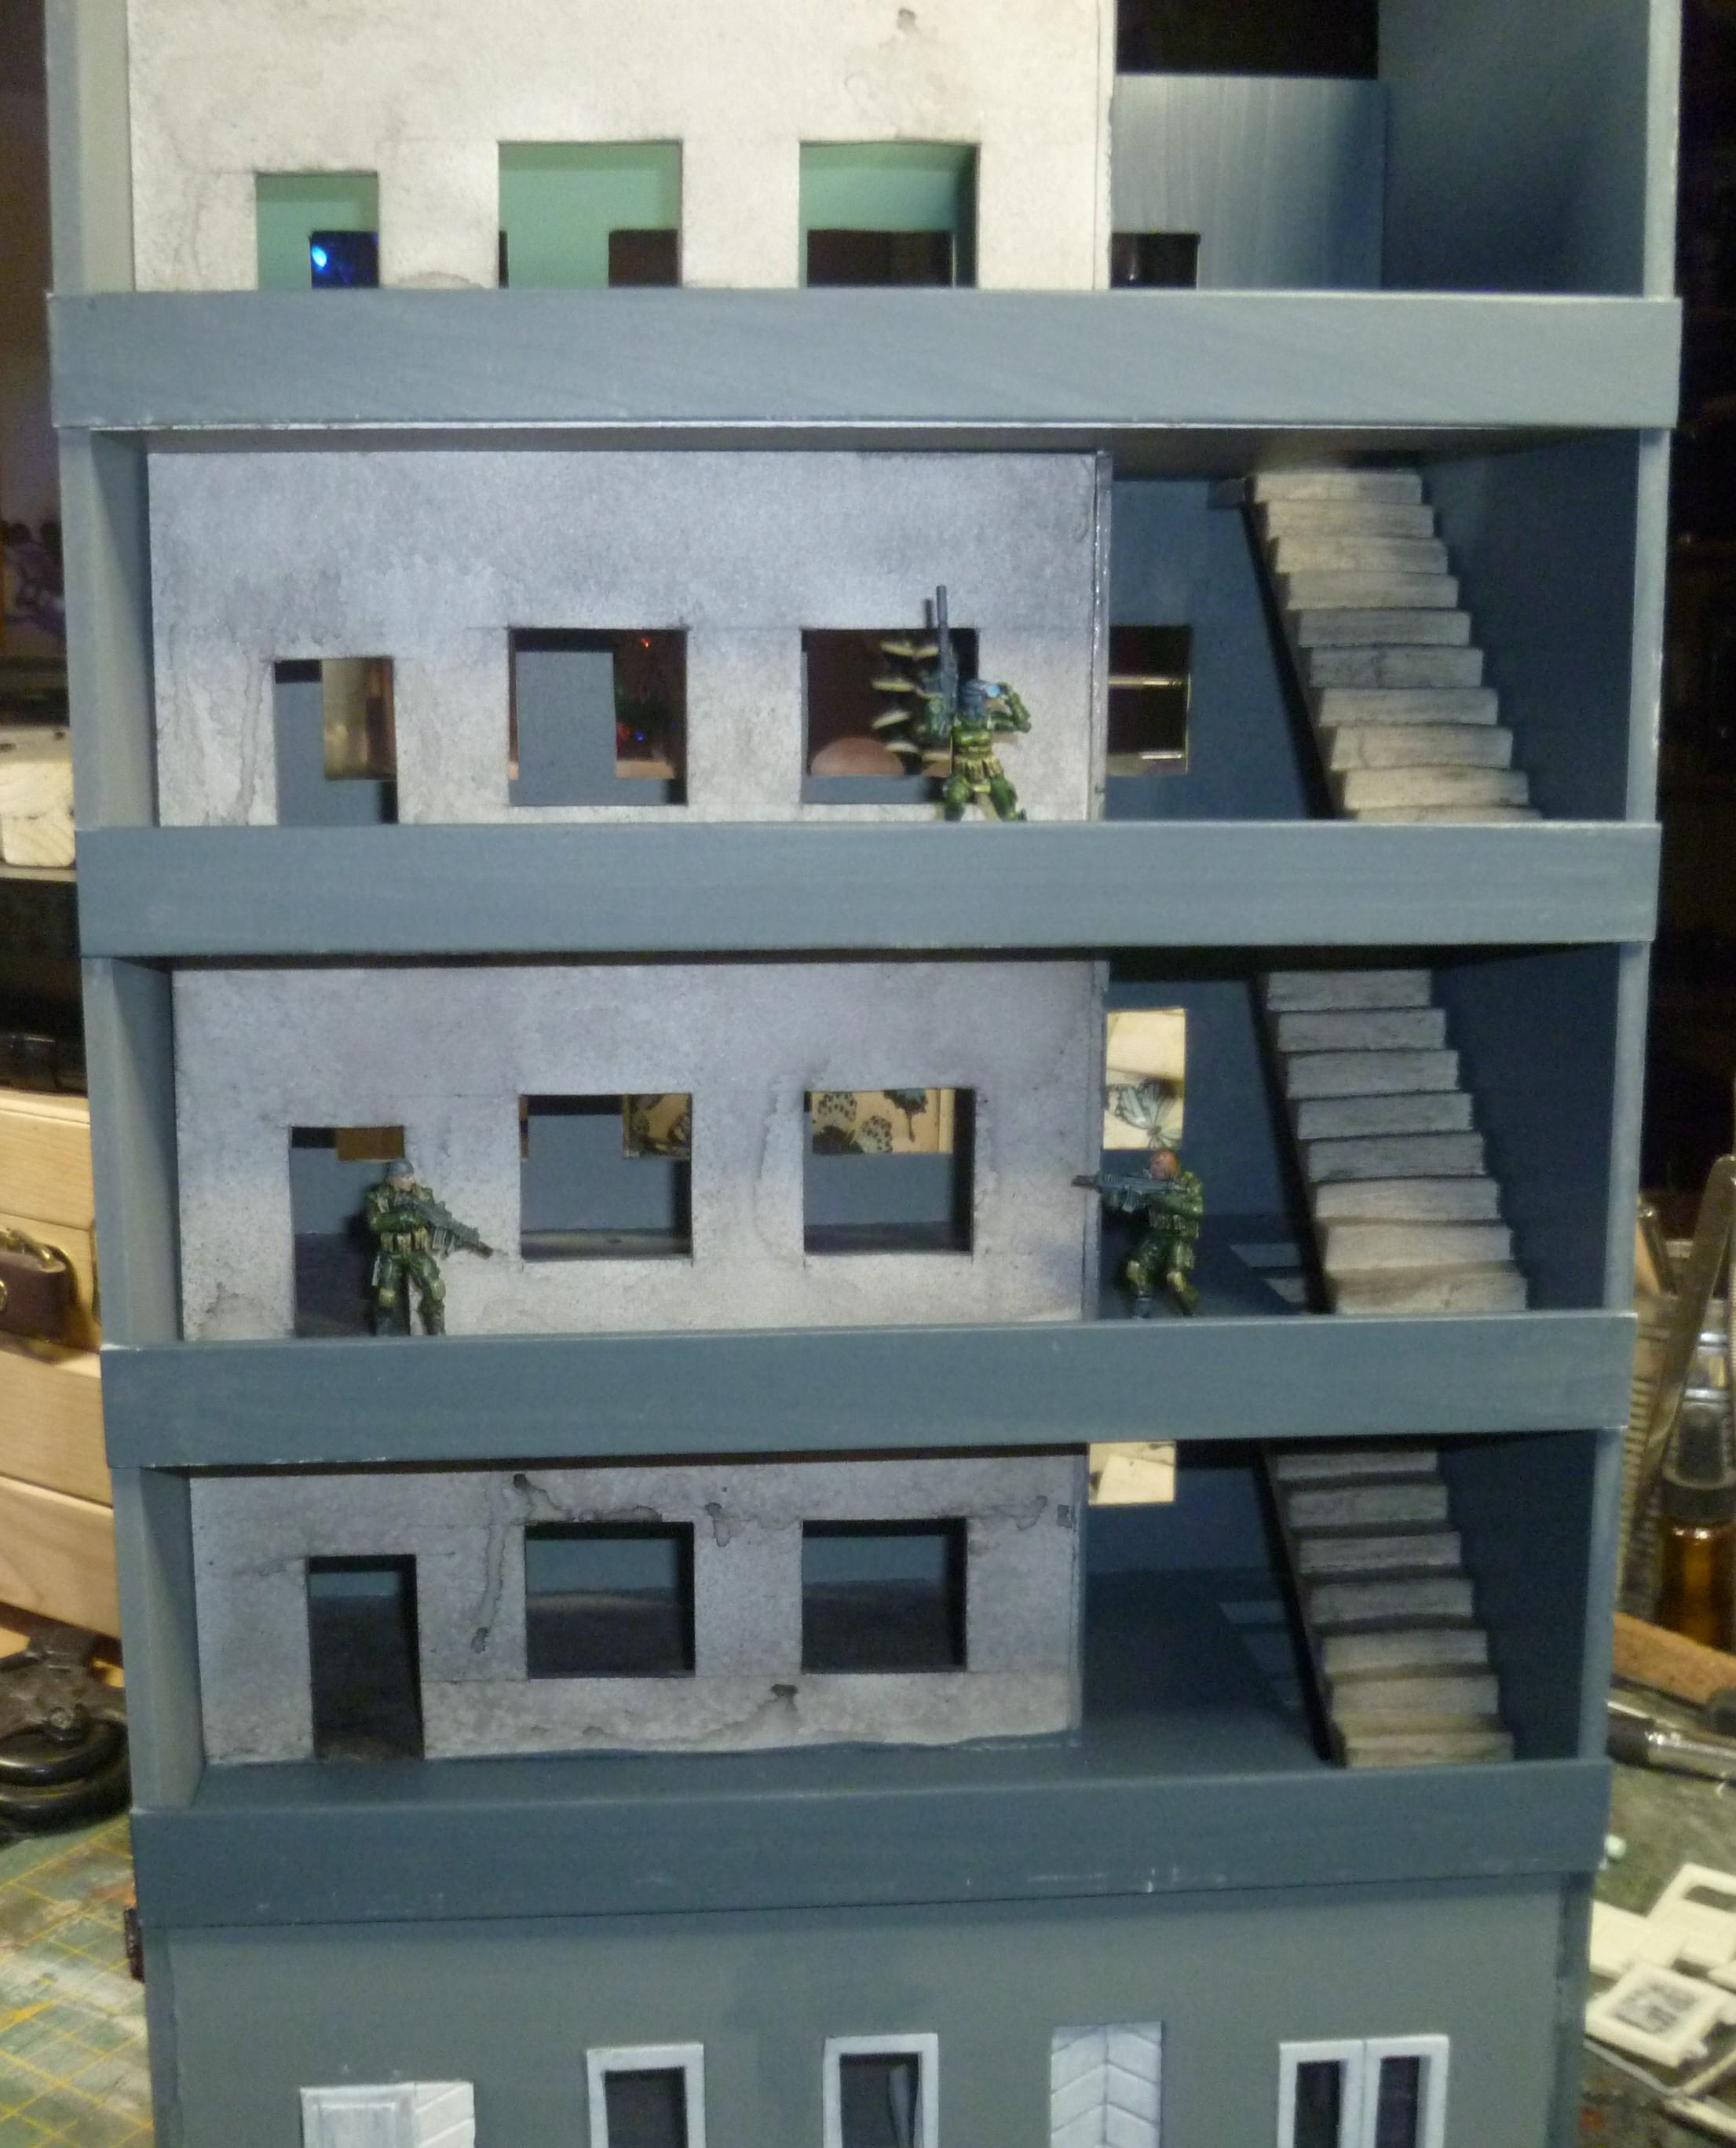 Apartements, Big, Modern, Tall, Terrain